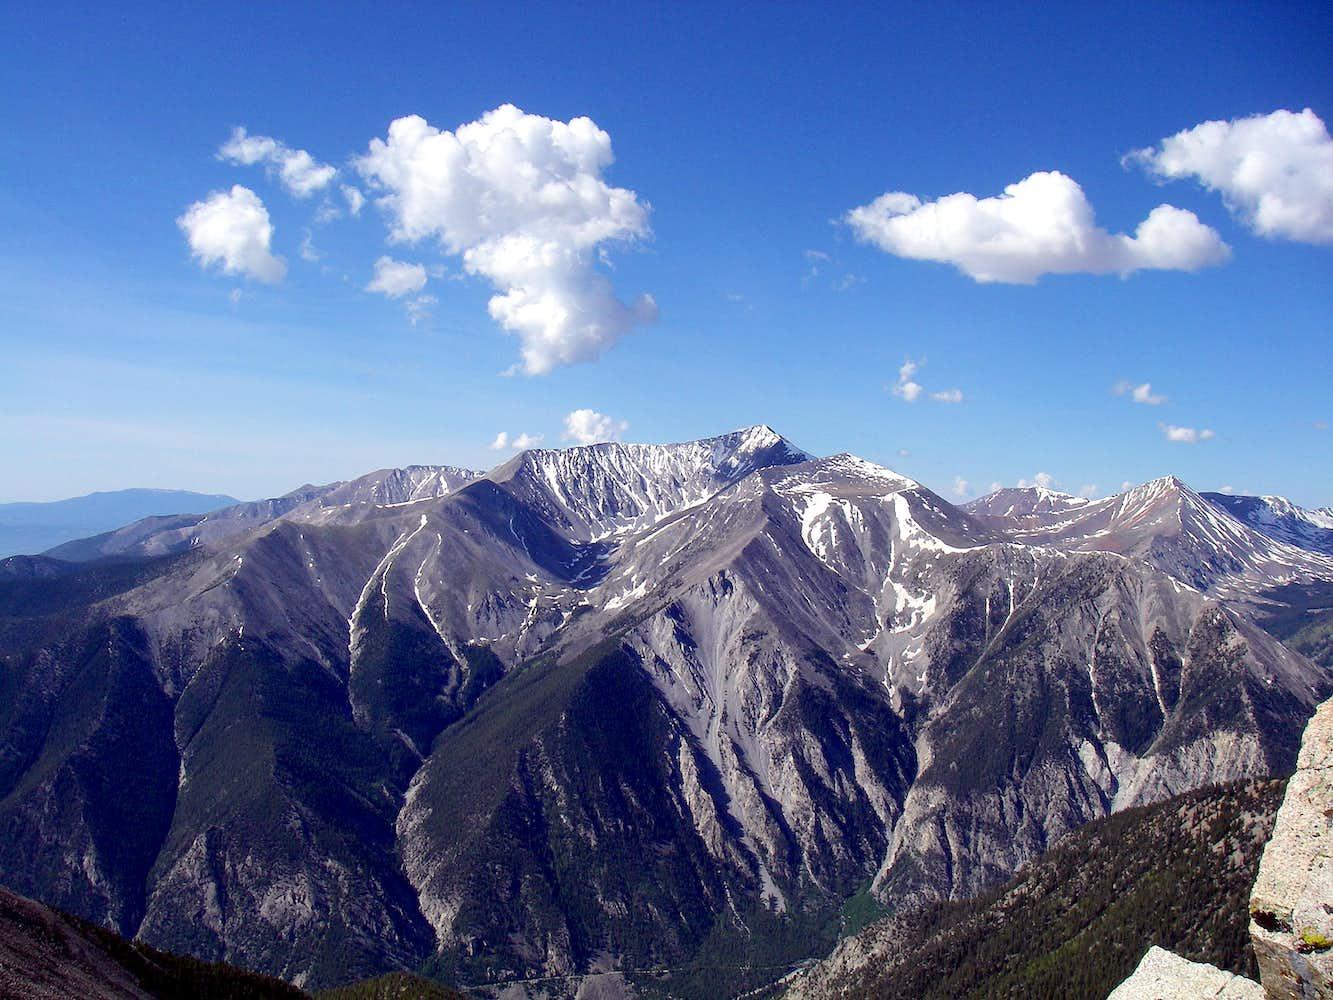 Mt. Antero - West Slopes via Baldwin Gulch | Rick Crandall